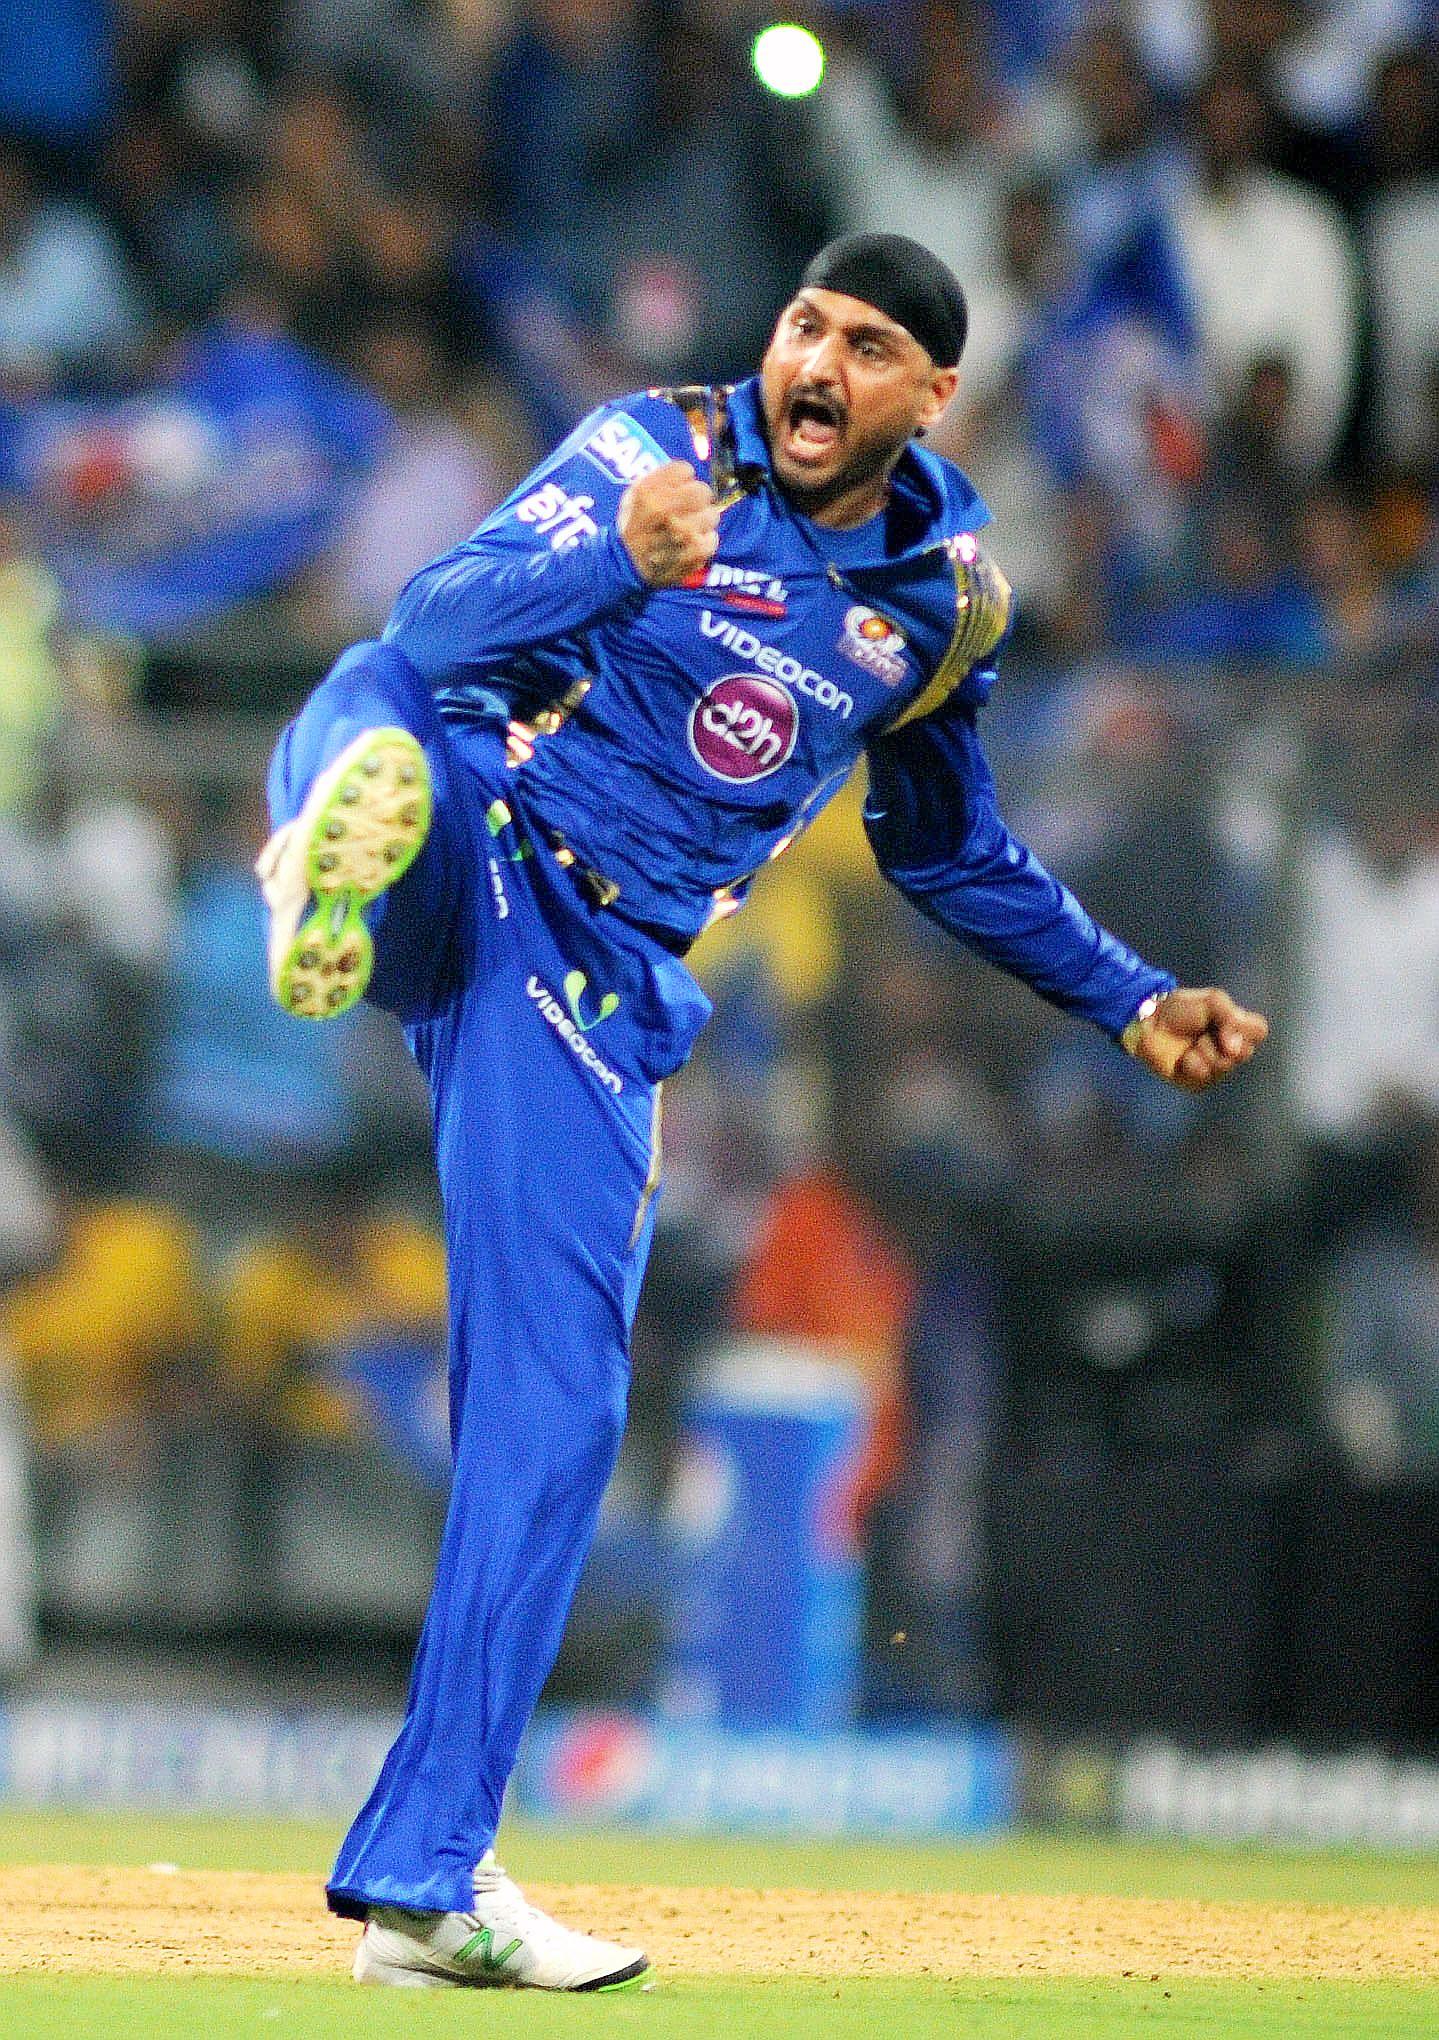 Wishing Indian cricket\s Turbanator a very happy birthday!